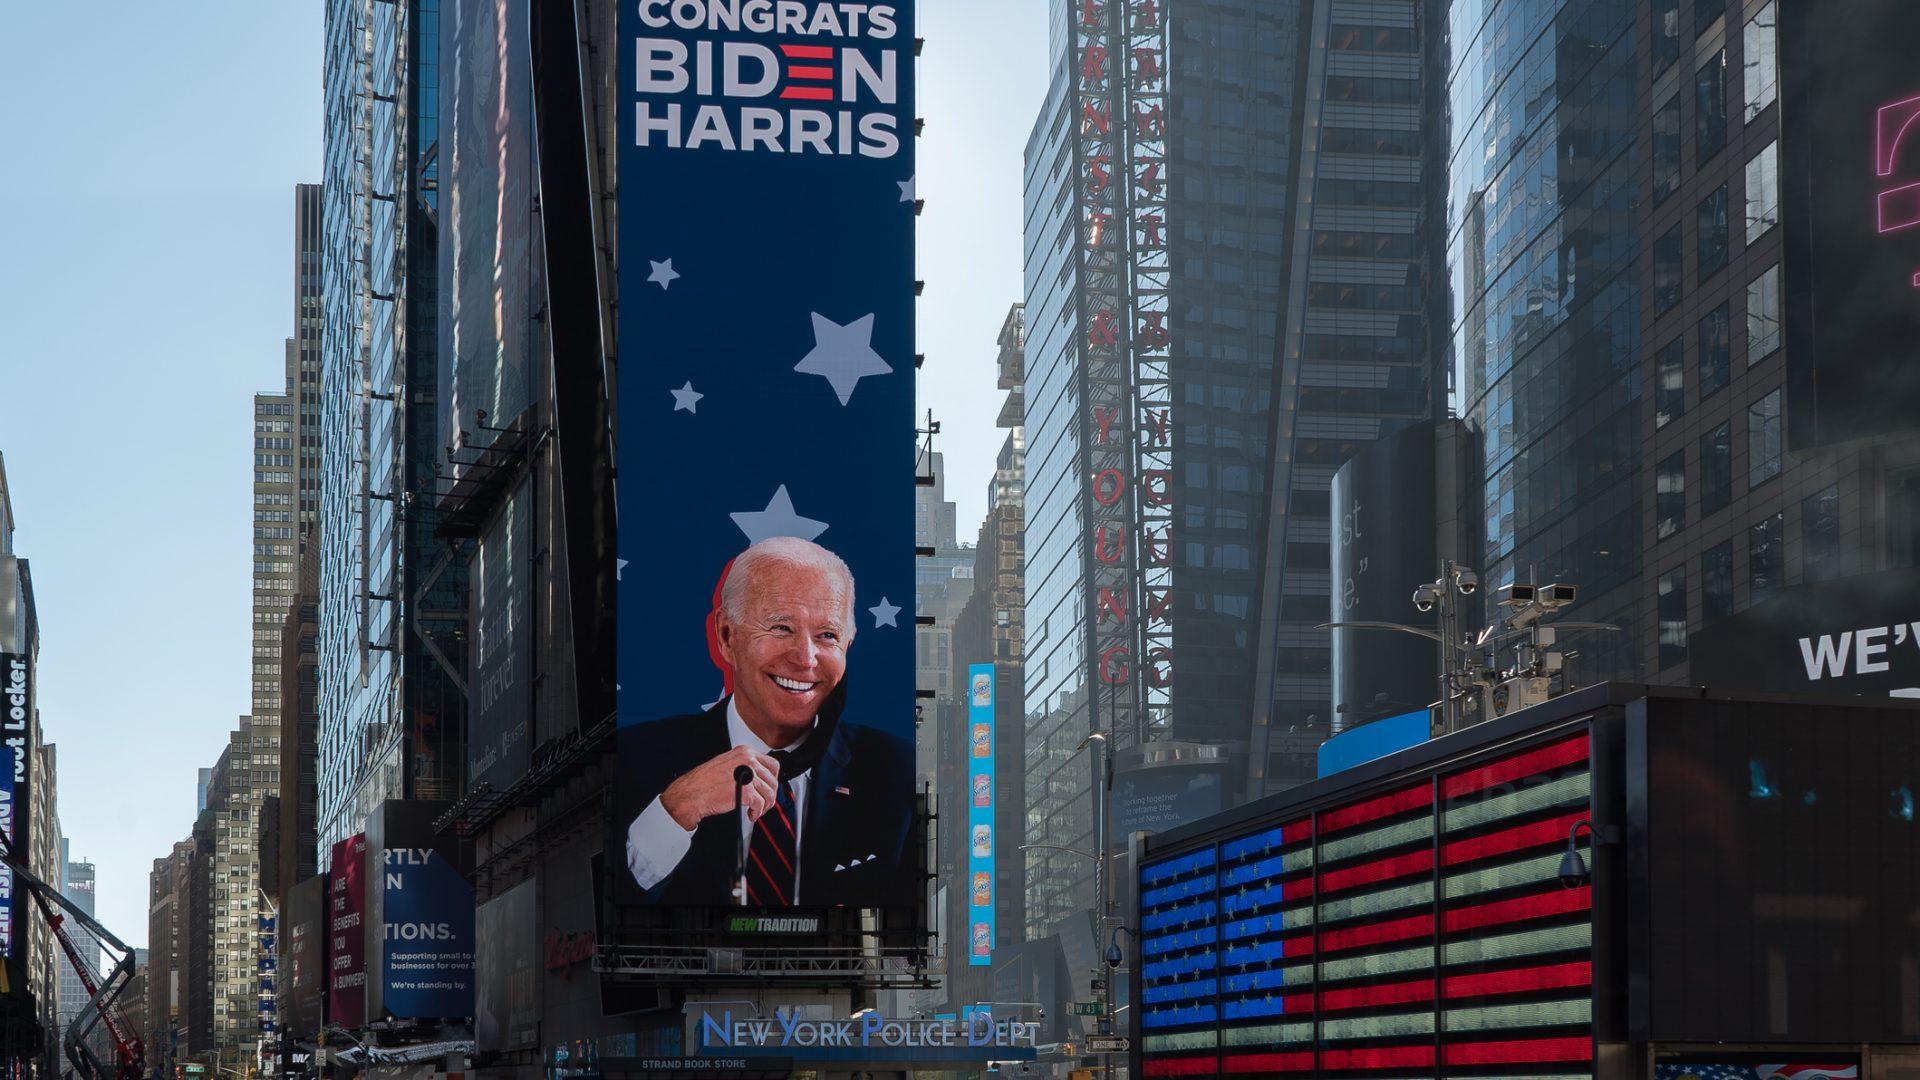 Manhattan, New York. November 09, 2020. Times Square tribute to president elect Joe Biden.